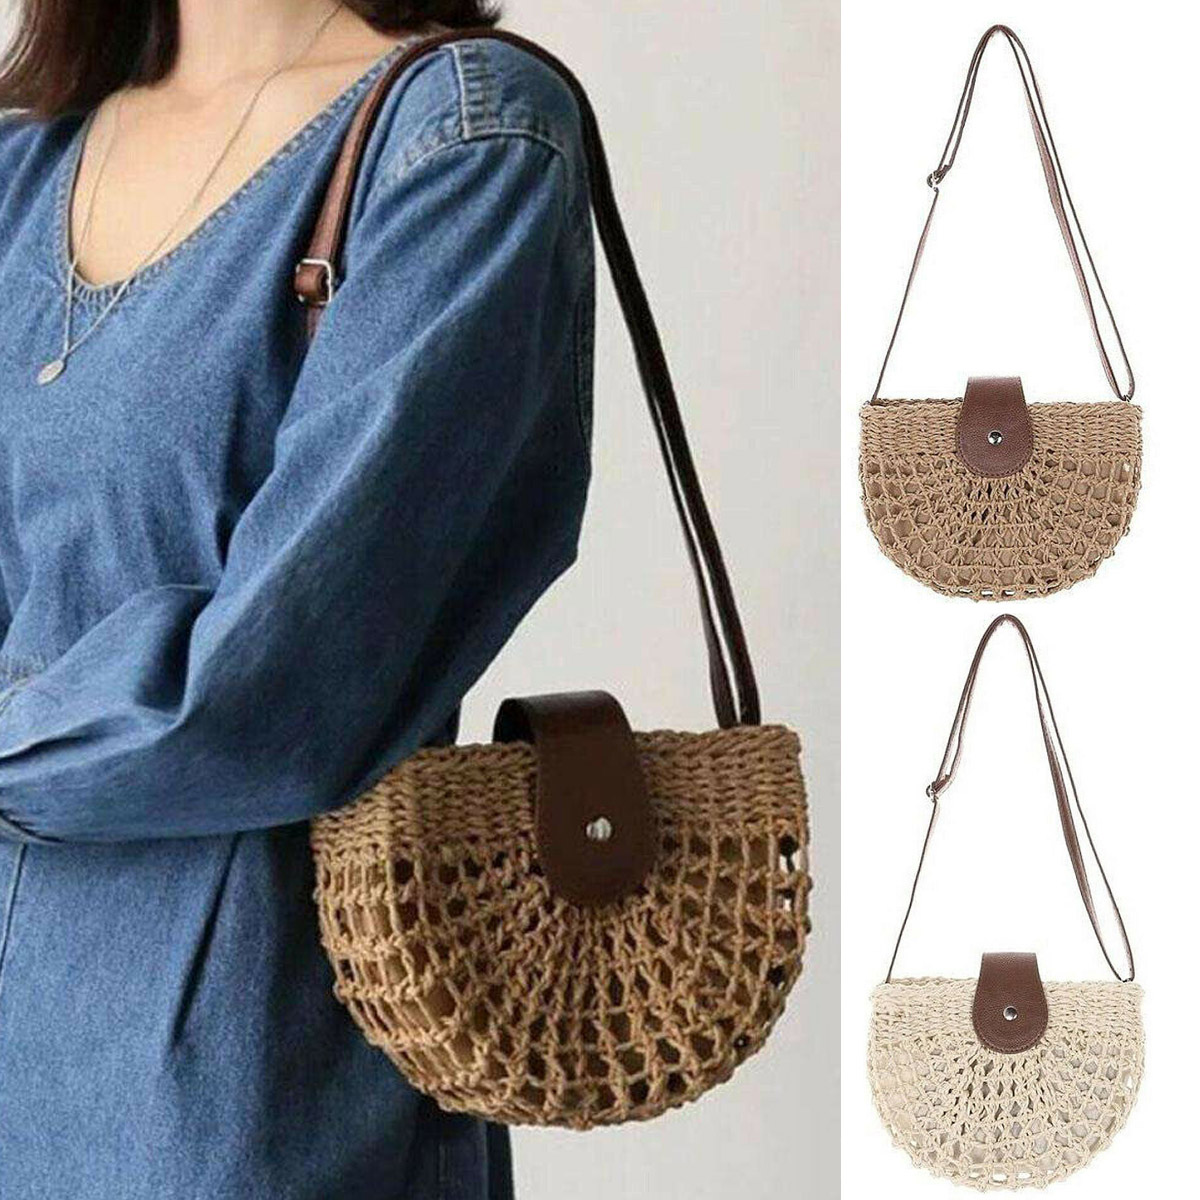 Women S Bags Handbags Clothing Shoes Accessories Fashion Women Straw Bag Beach Rattan Shoulder Wicker Weave Crossbody Handbag Us Myself Co Ls